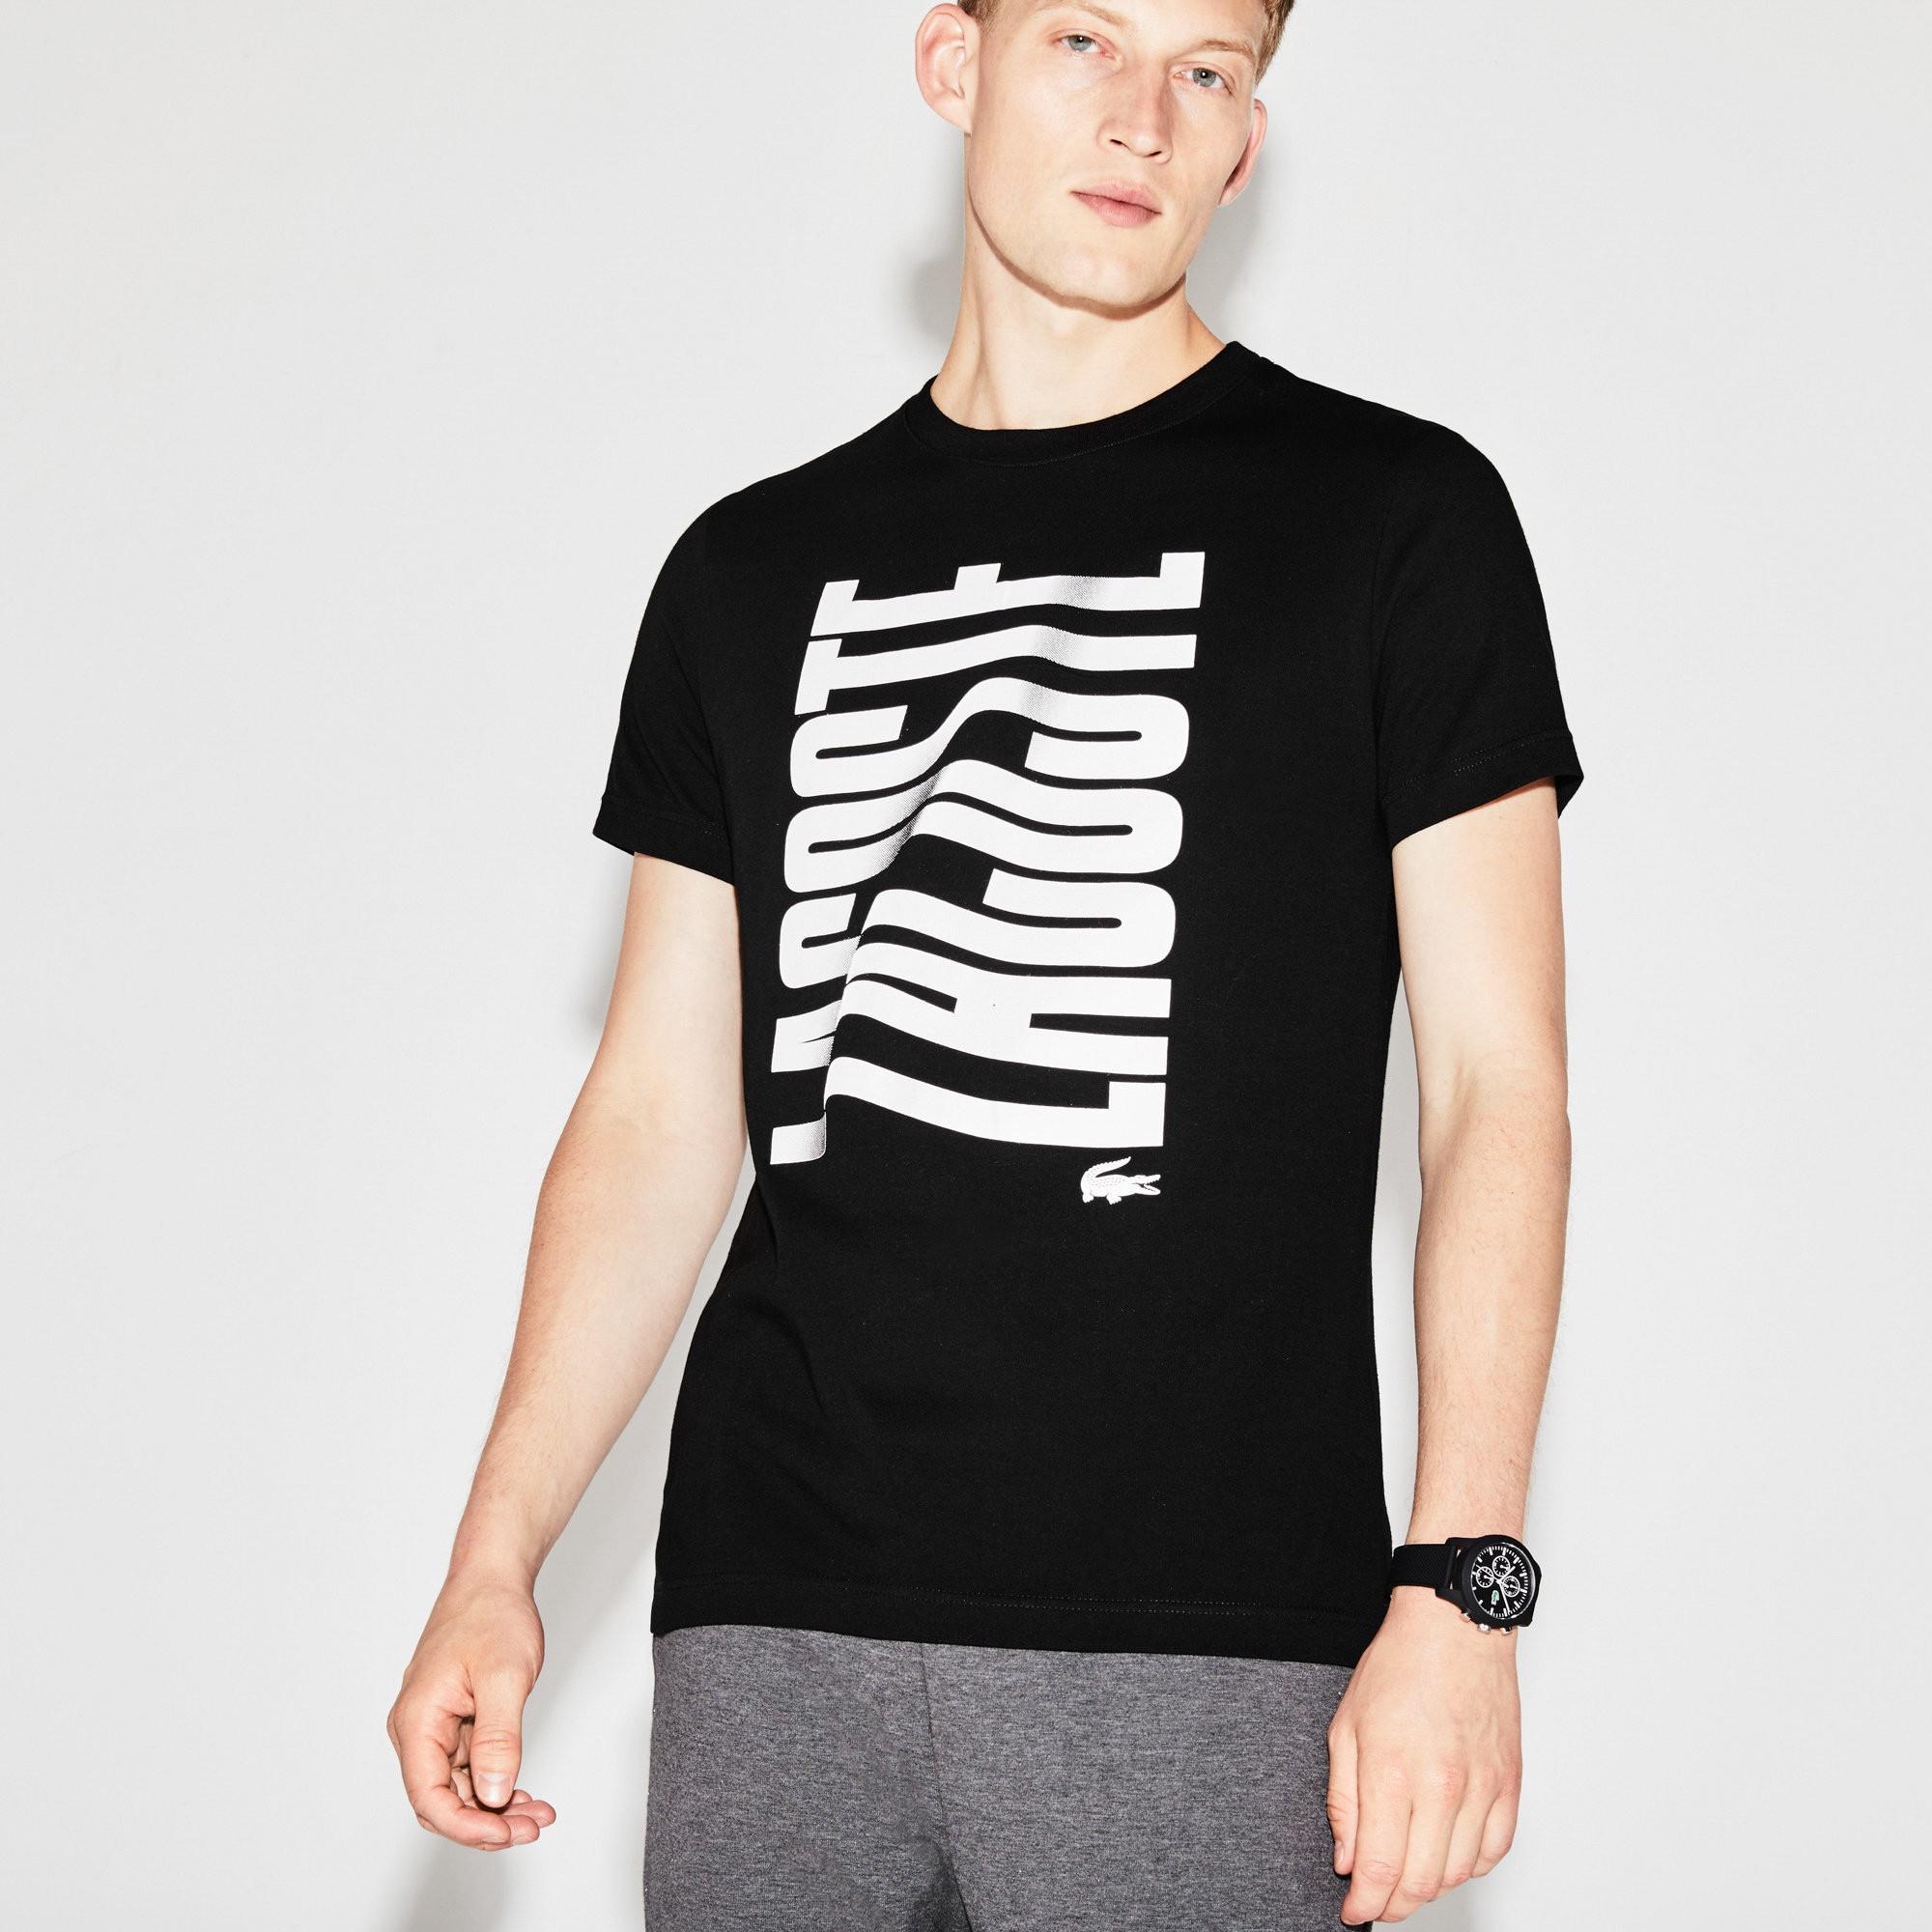 5cdb7b32d78 Lacoste Men's Sport Tennis Print Tech Jersey T-Shirt In Black/White ...